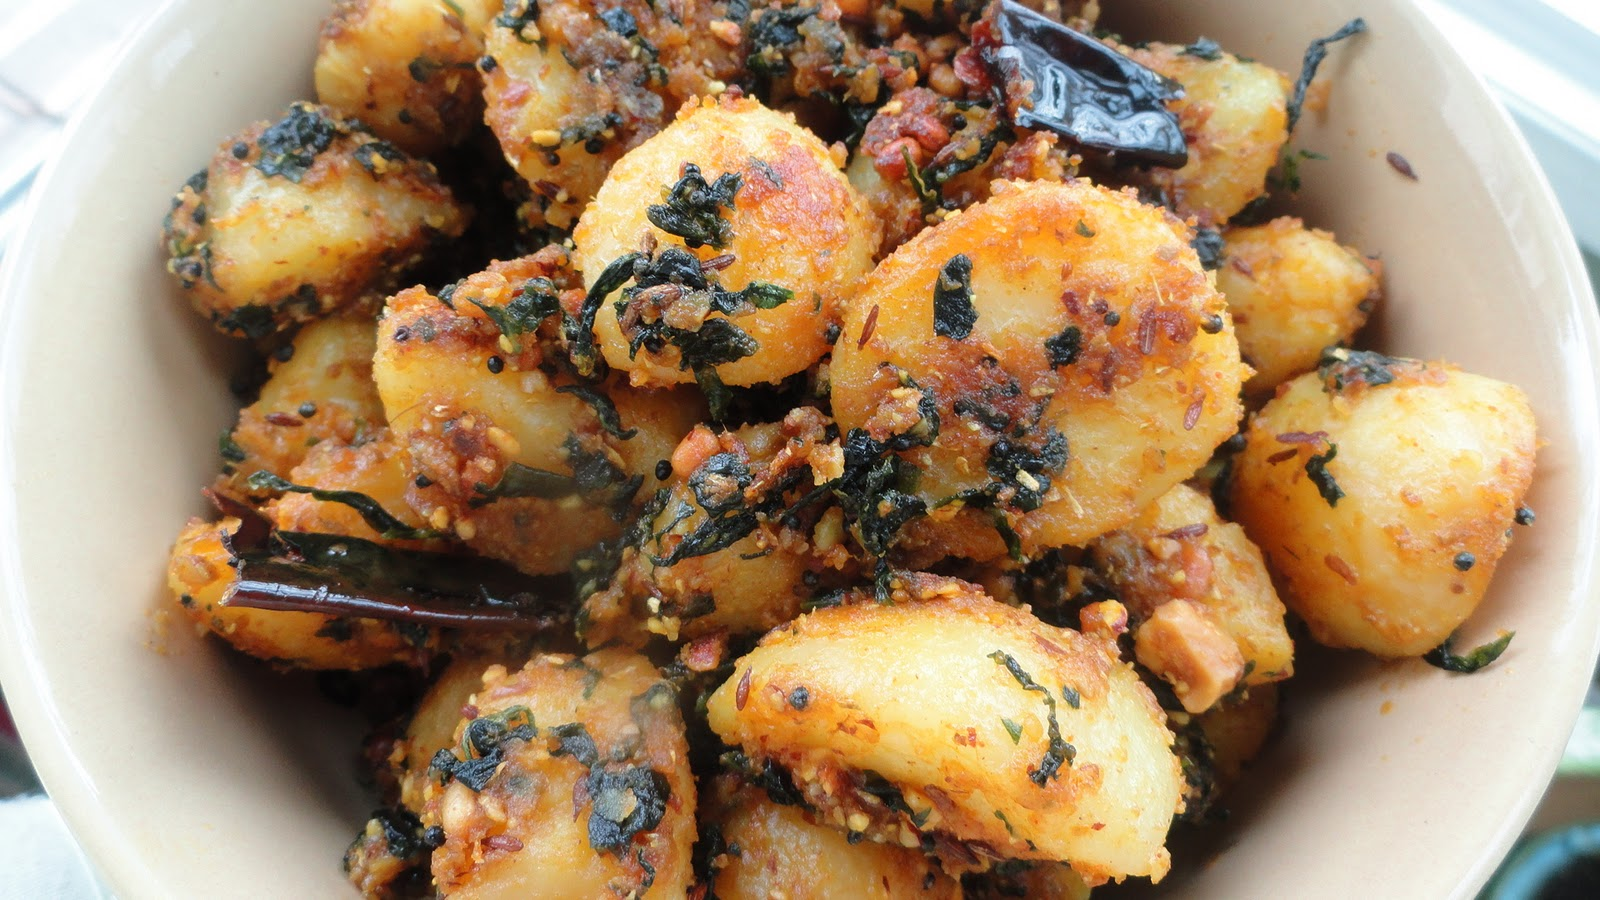 ... : Methi Aloo with Badam / Potatoes with Fenugreek Leaves and Almonds